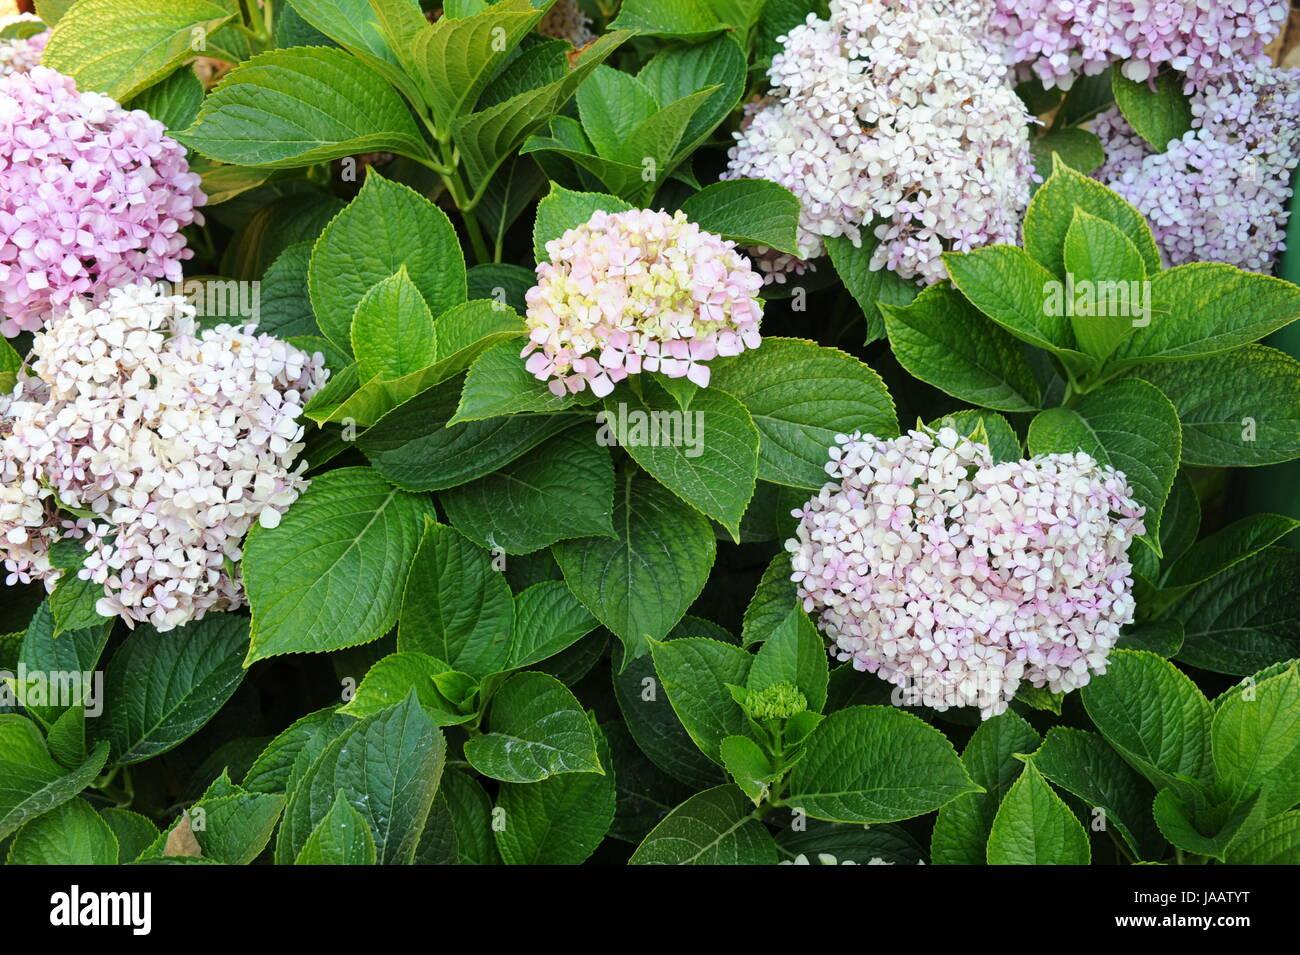 spain - hydrangeas flower Stock Photo